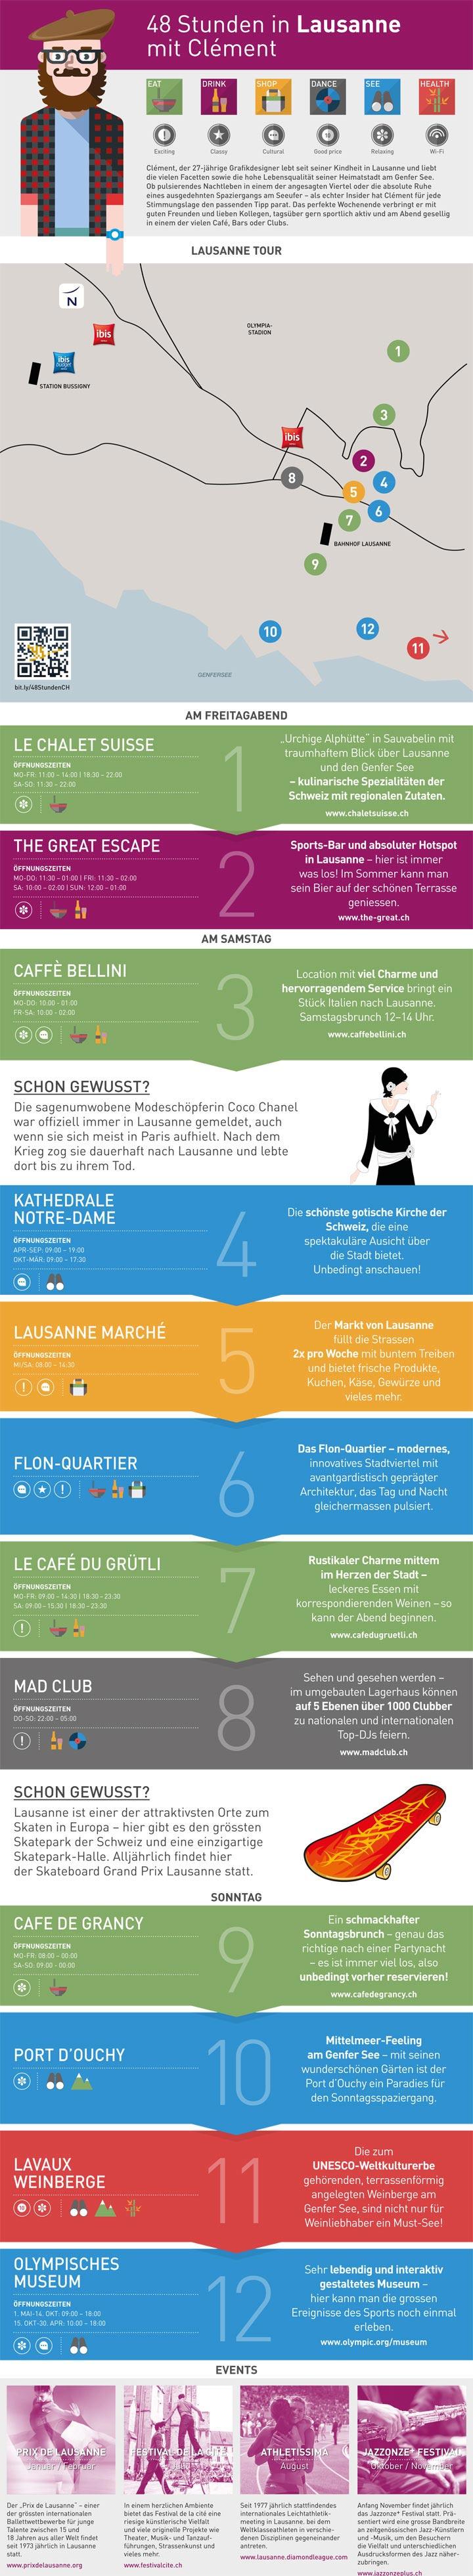 lausanne infografik